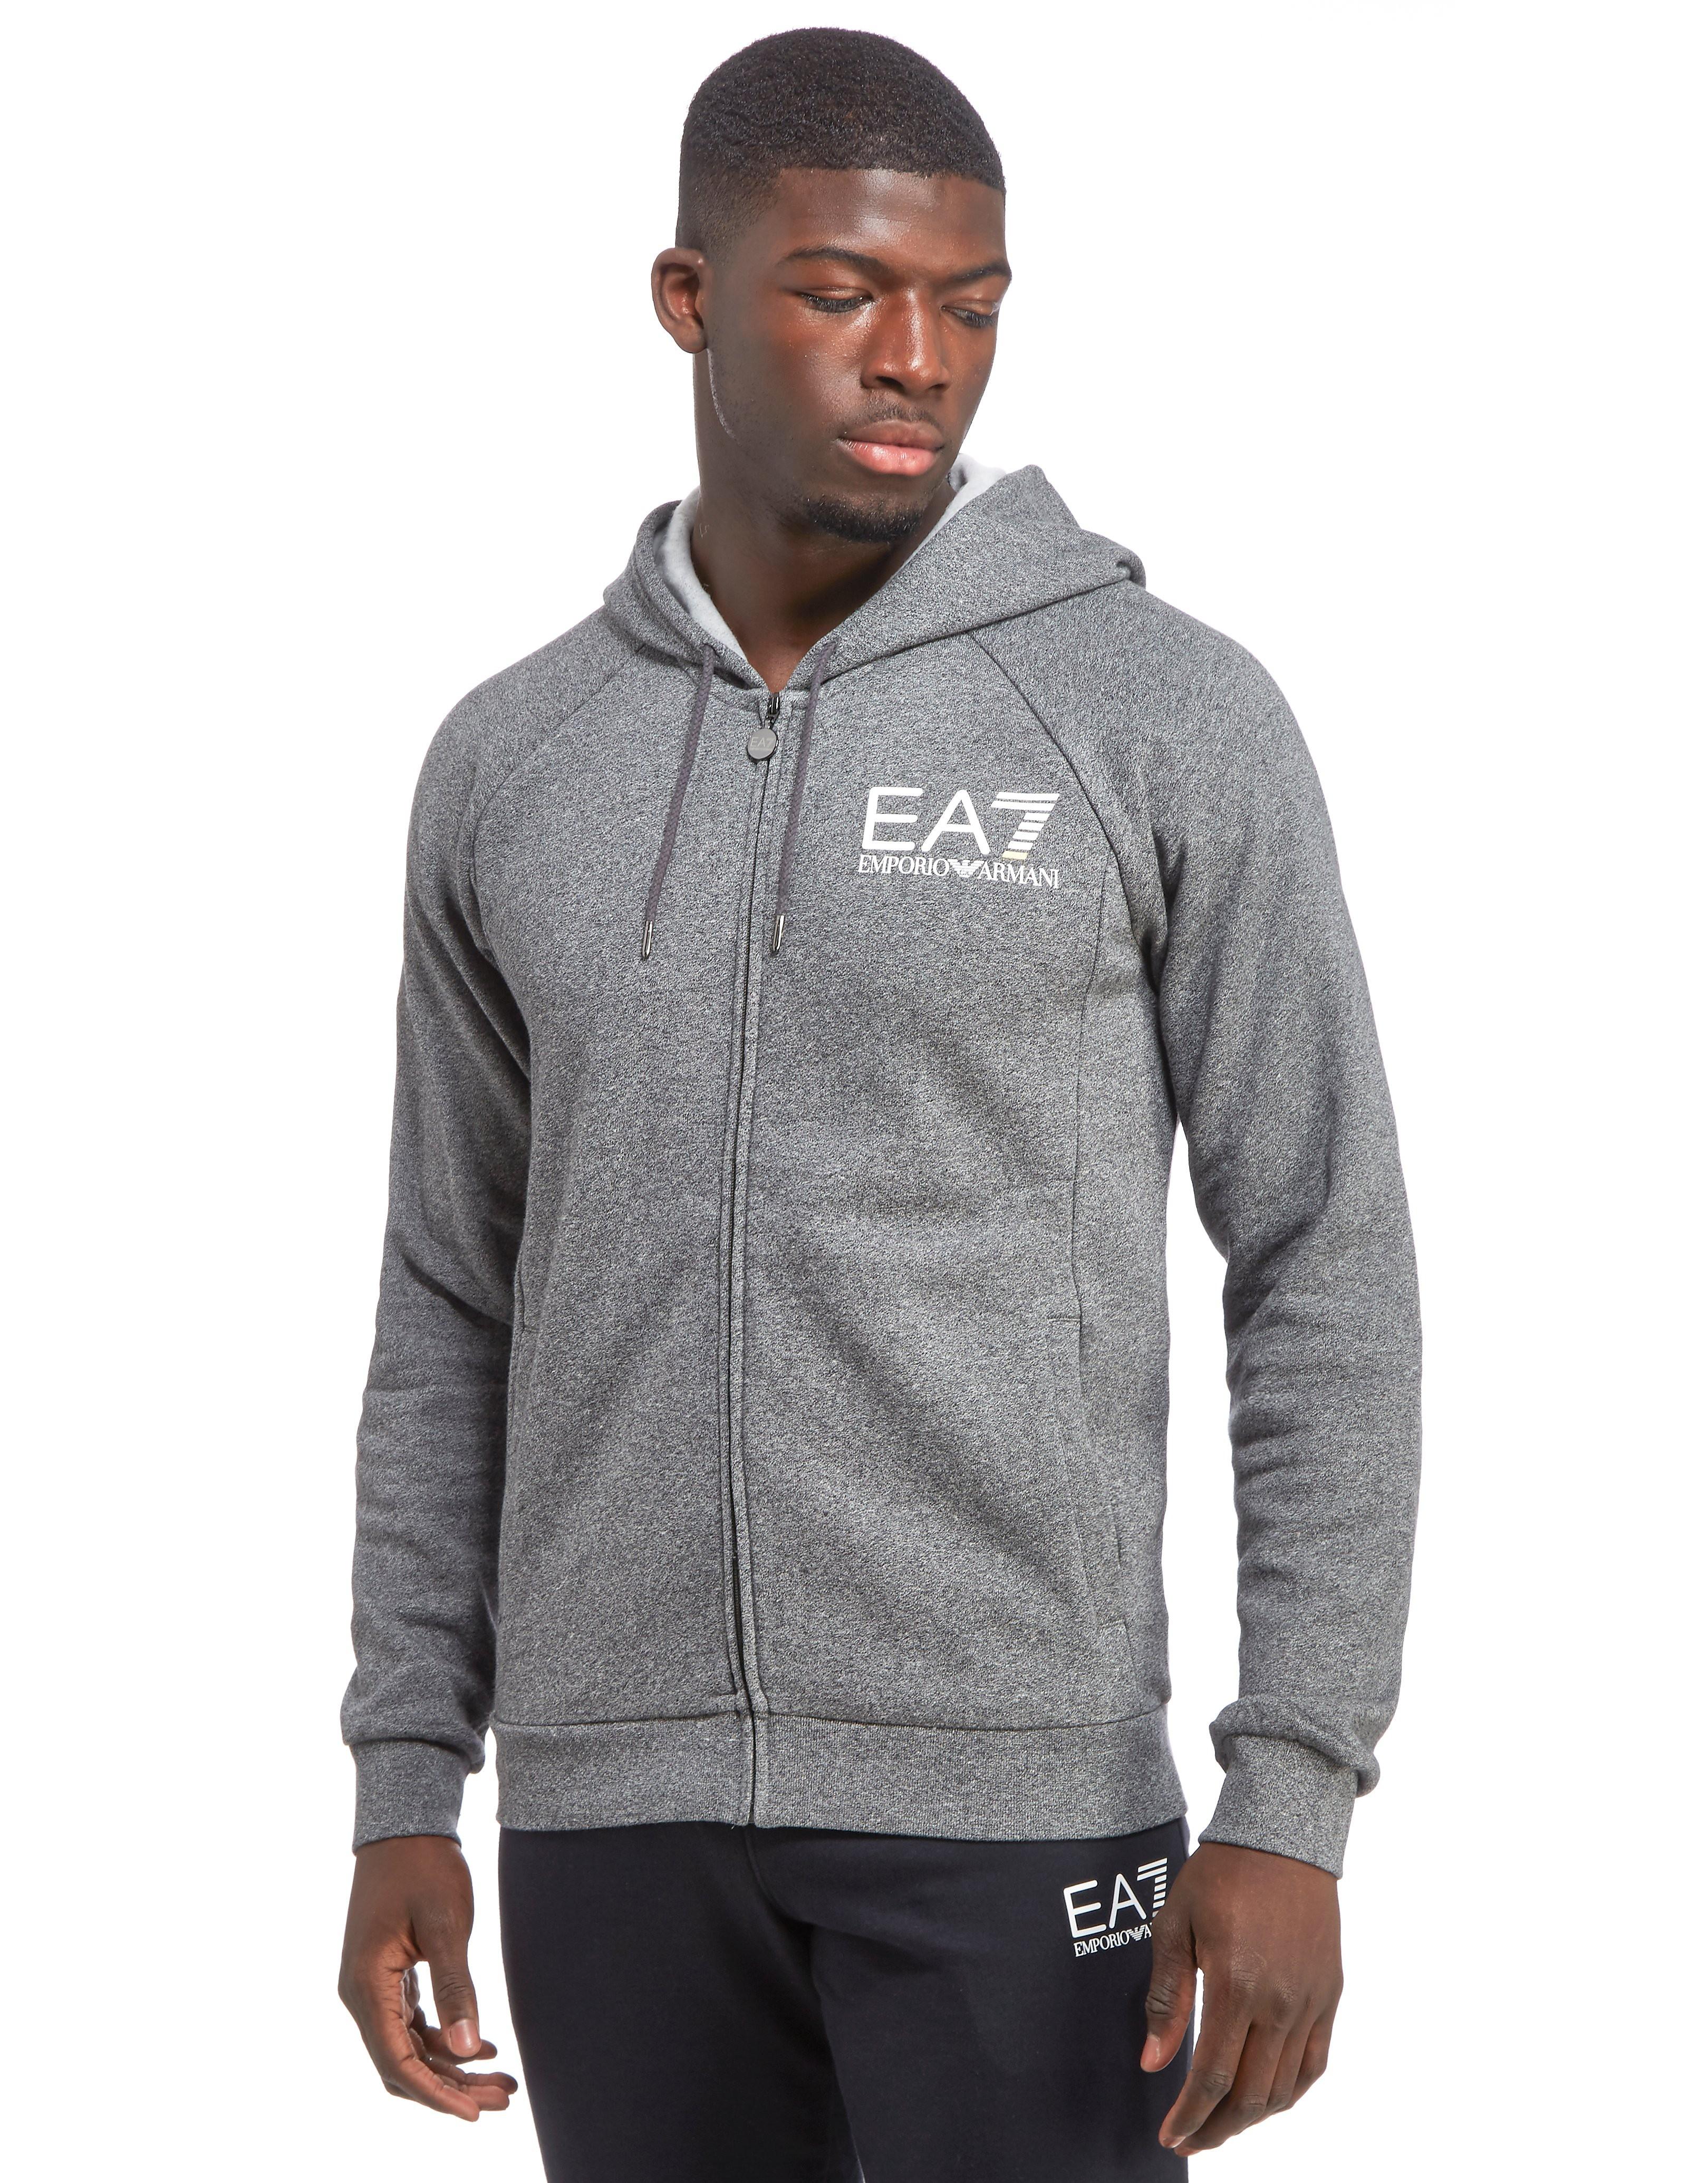 Emporio Armani EA7 Enhanced Hoody